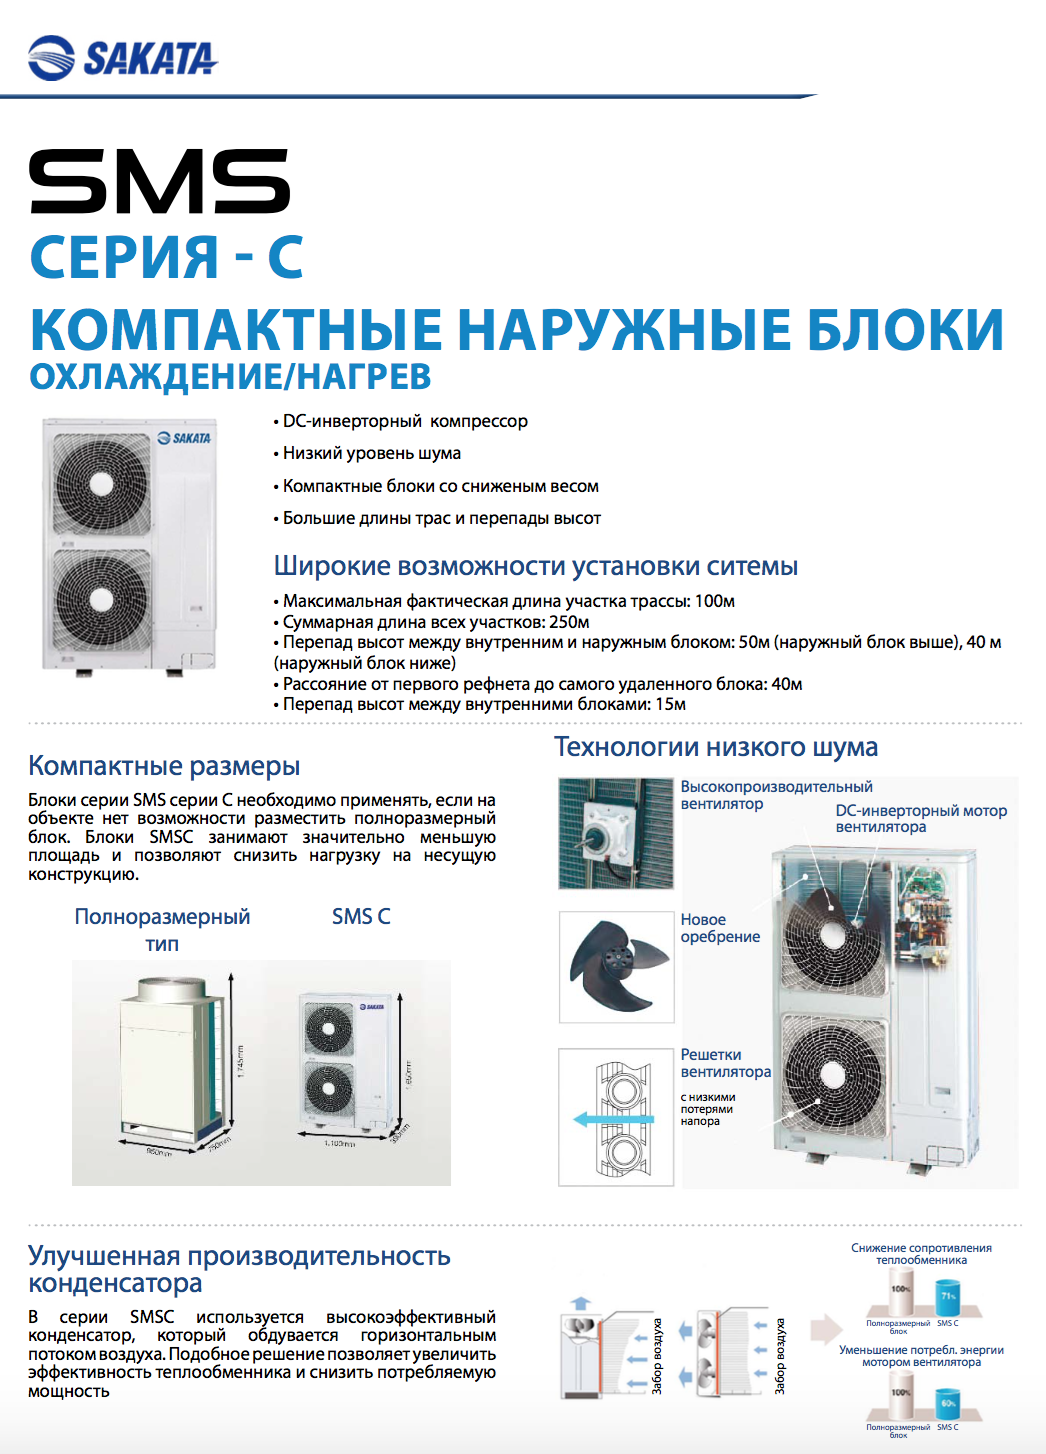 VRF_SMS_серия_C_2.png